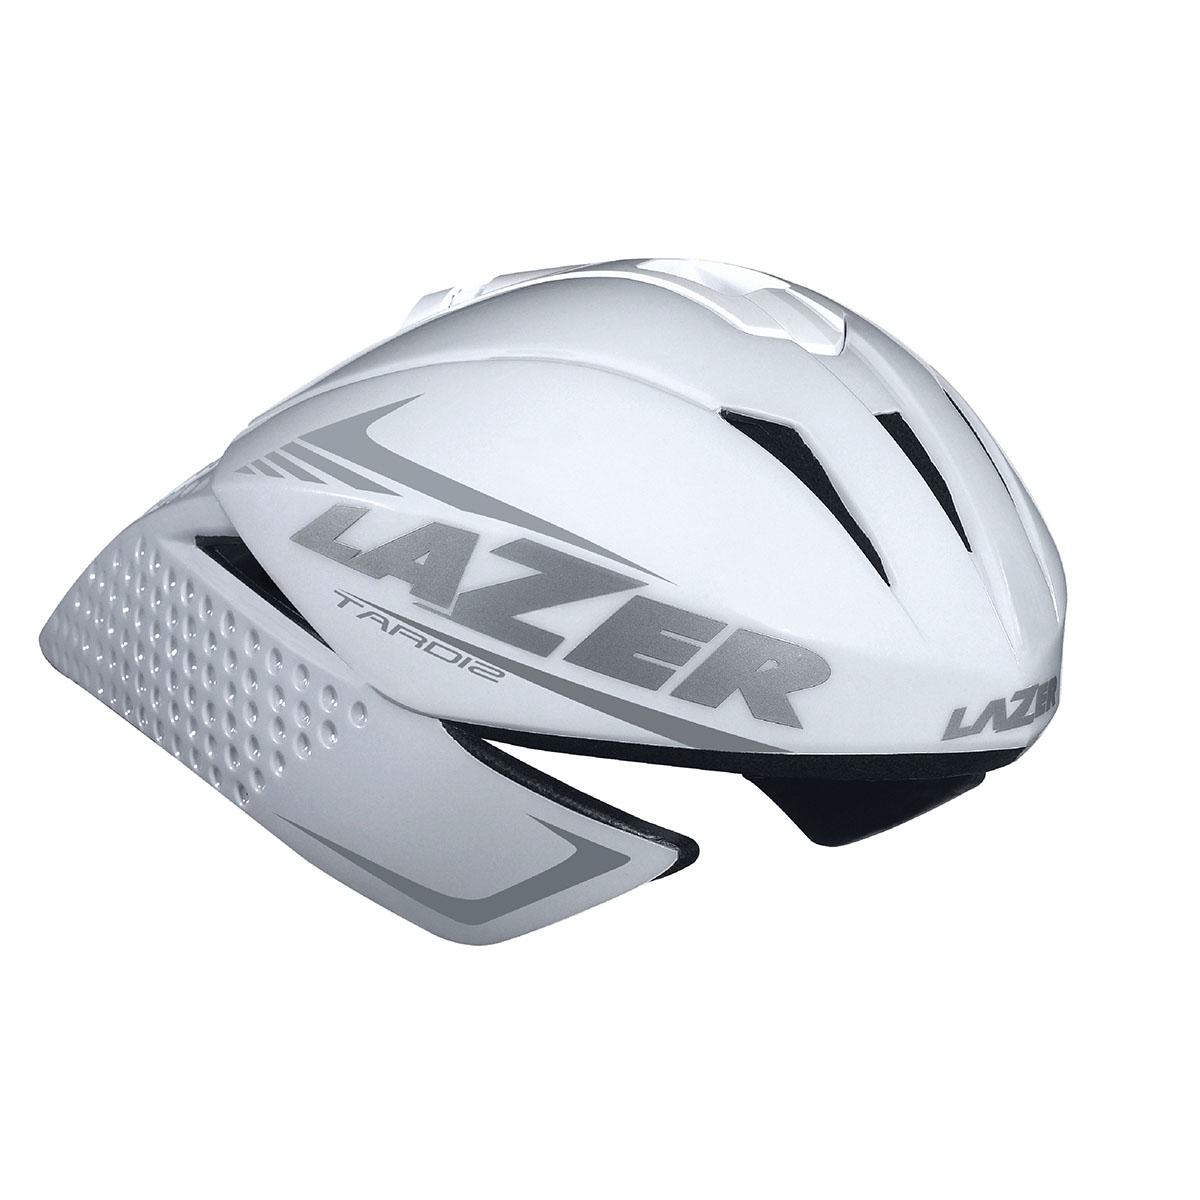 BLC2005669022 Lazer Tardiz Helmet